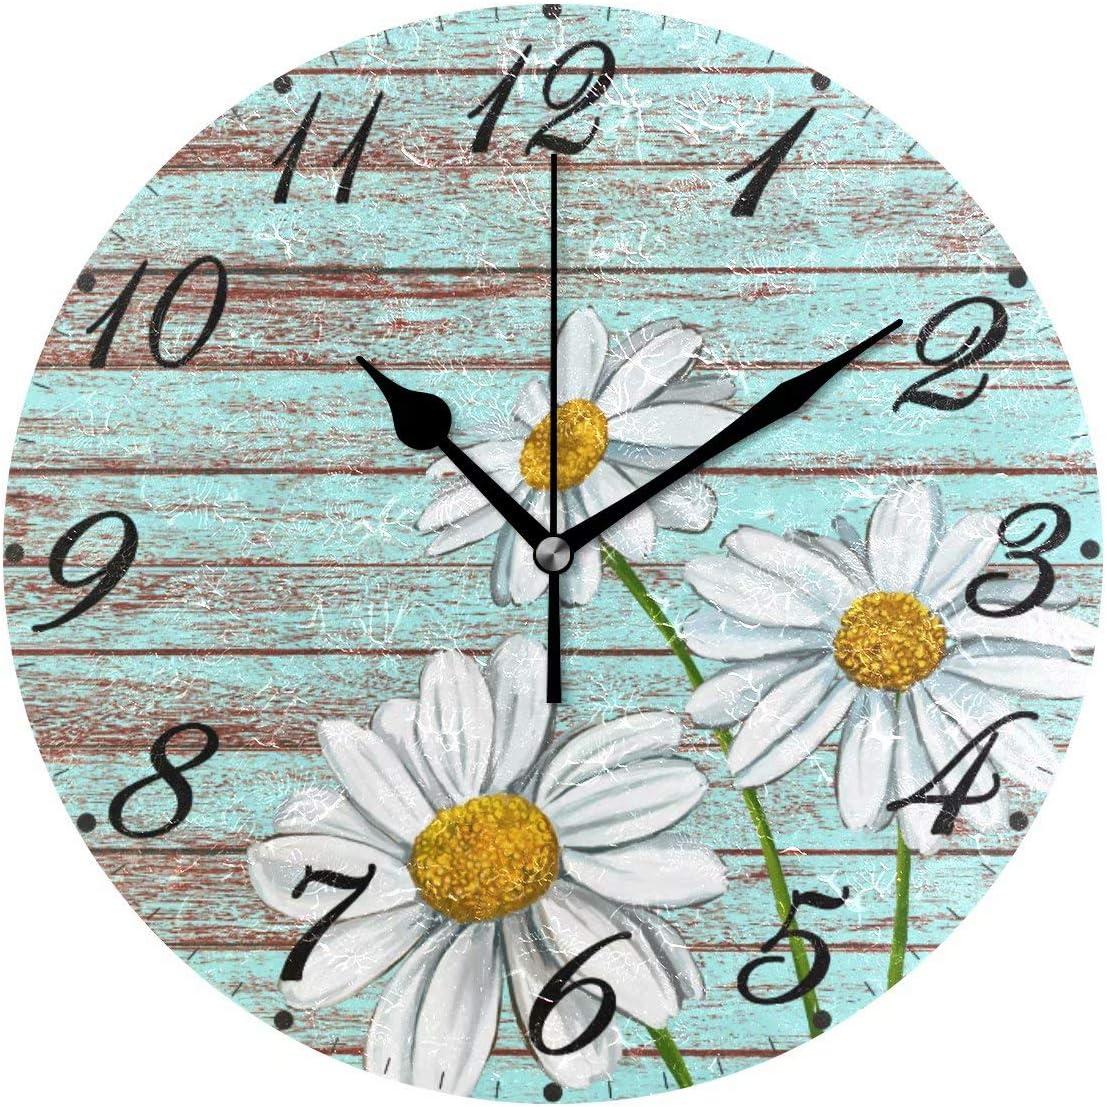 Pfrewn Wooden Sunflower Daisy Wall Clock Silent Non Ticking Retro Bird Floral Clocks Battery Operated Watercolor Vintage Desk Clock 10 Inch Quartz Analog Quiet Bedroom Living Room Home Decor